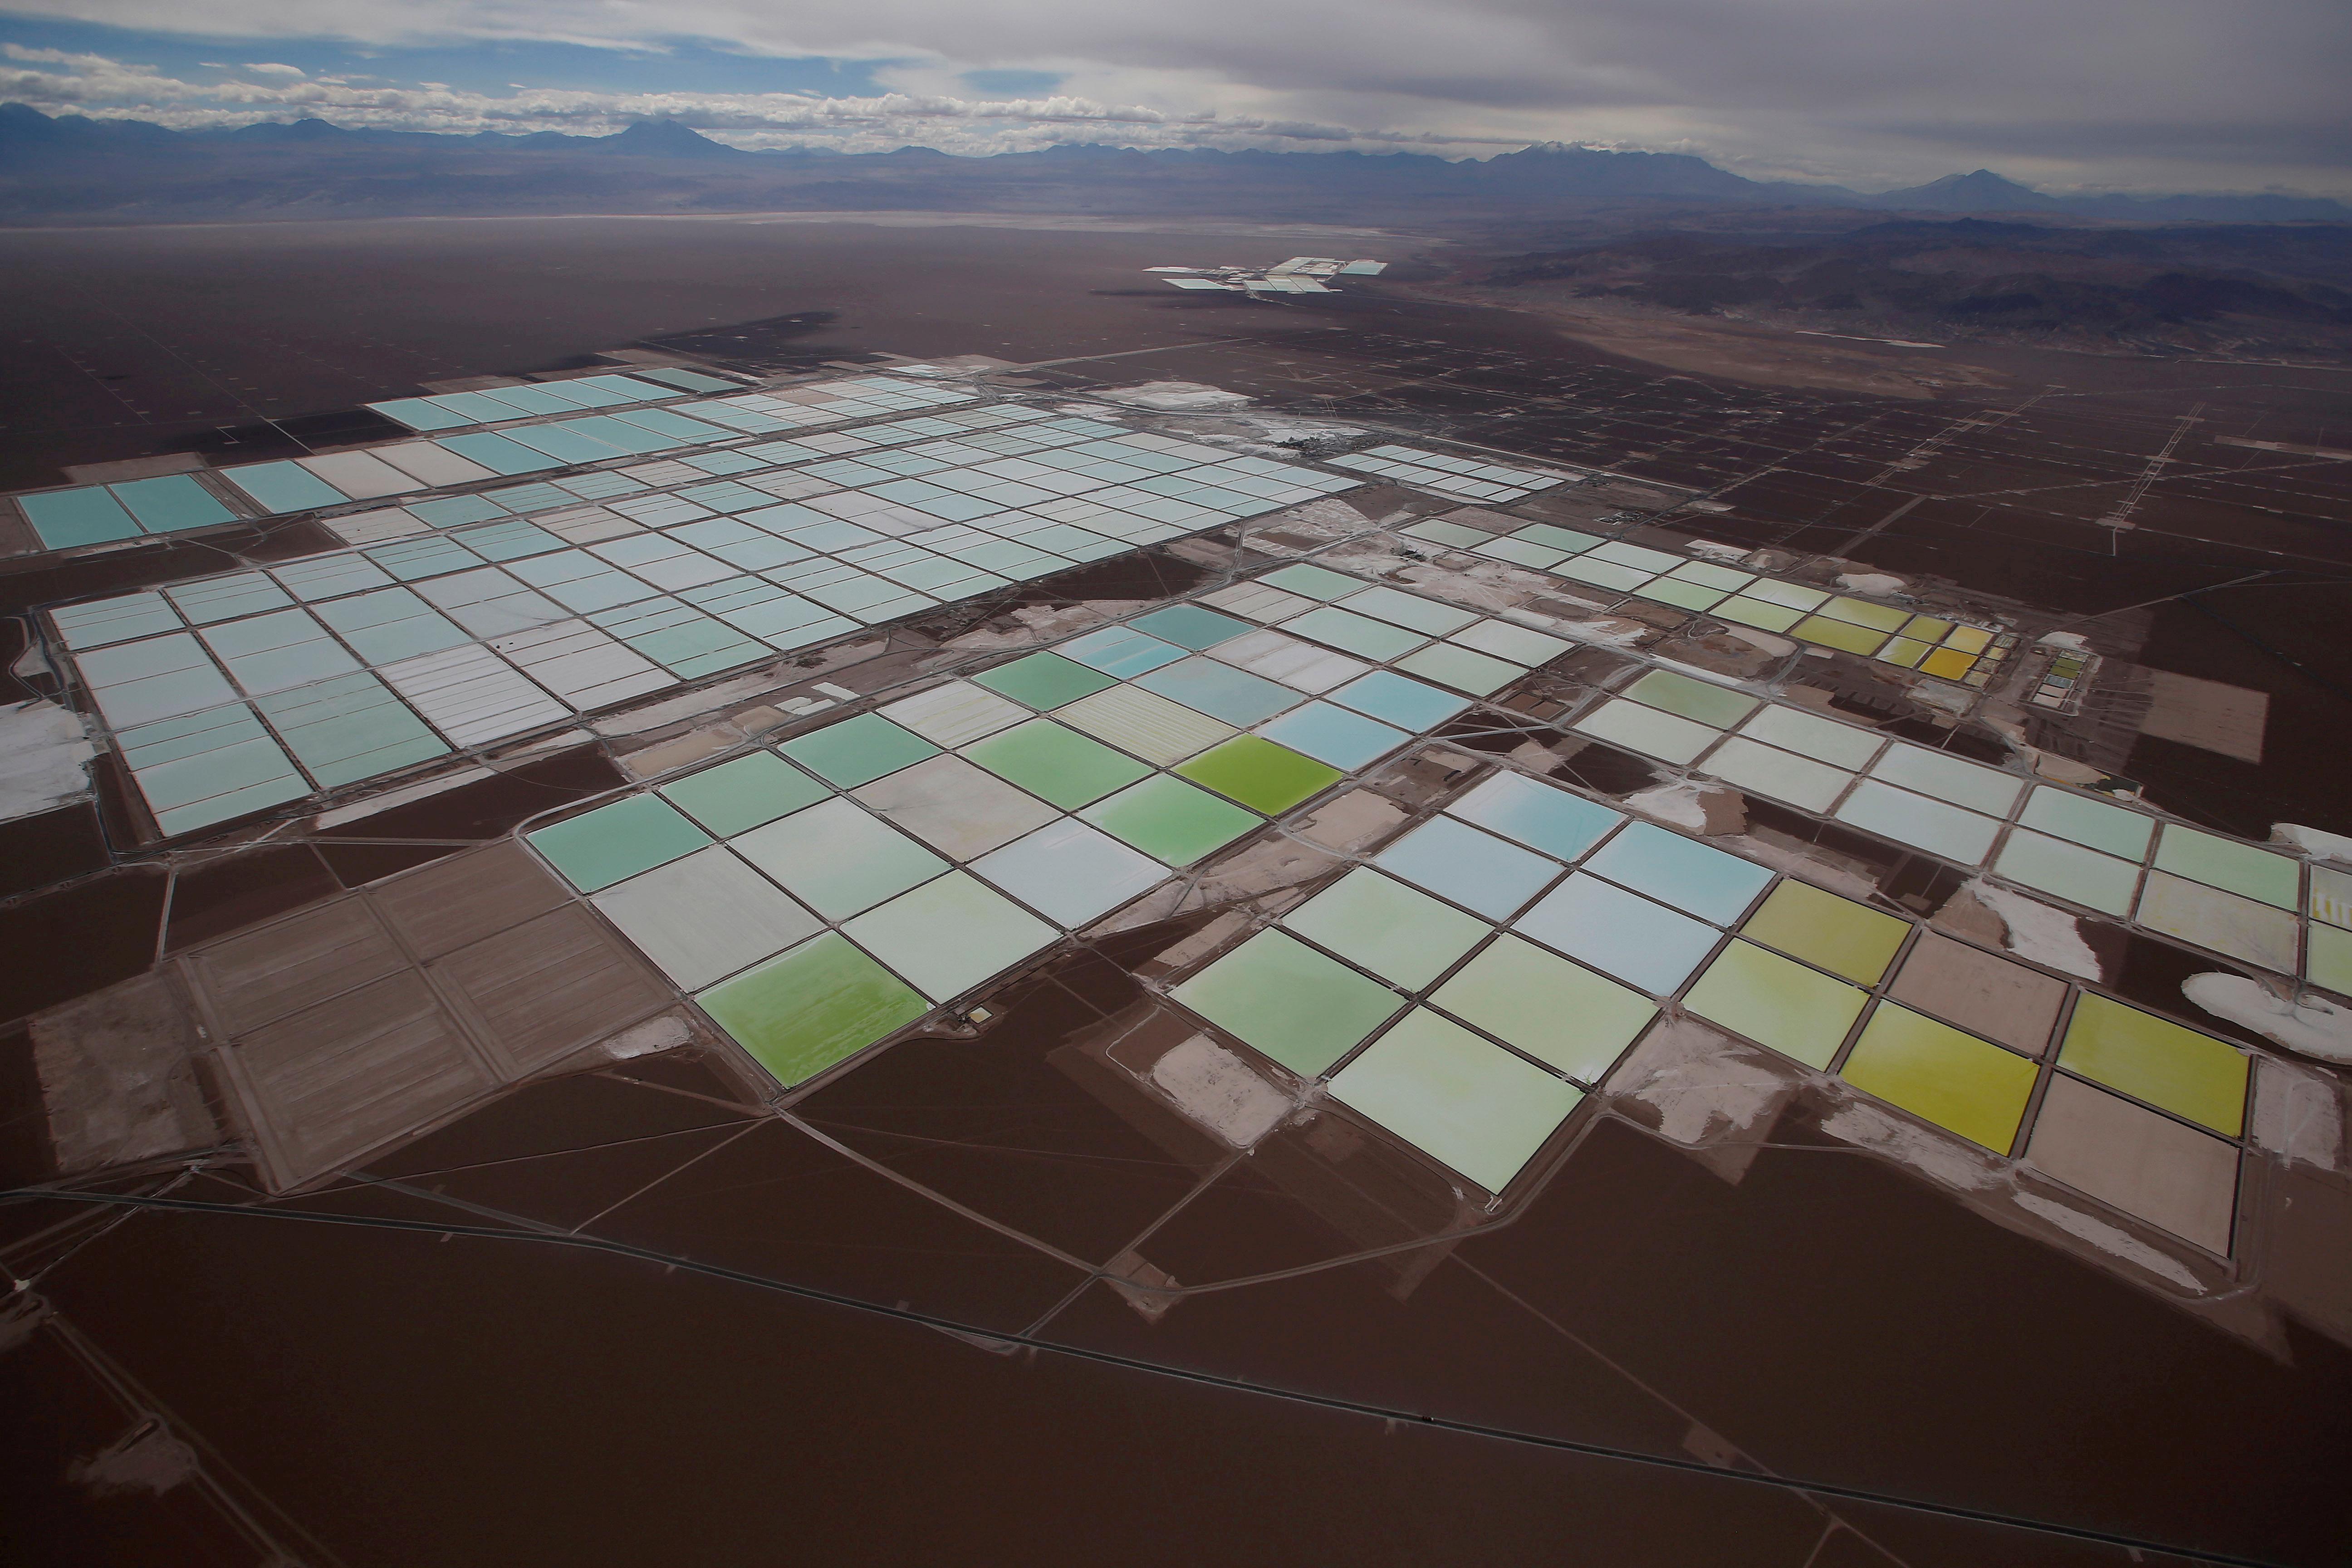 An aerial view shows the brine pools of SQM lithium mine on the Atacama salt flat in the Atacama desert of northern Chile, January 10, 2013. REUTERS/Ivan Alvarado